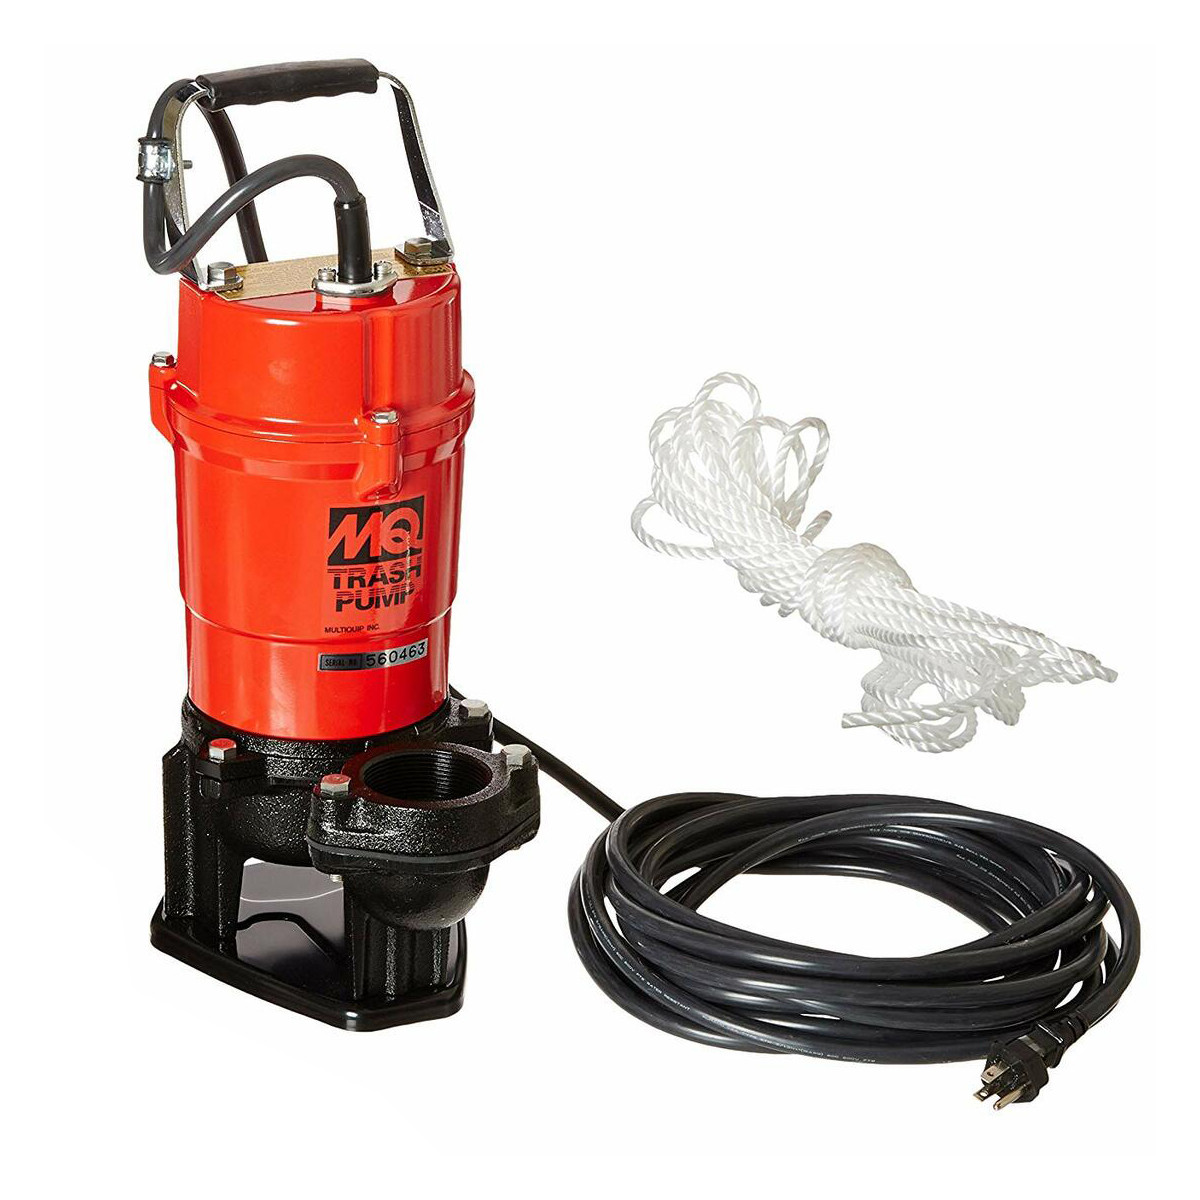 Multiquip 2 in Submersible Pump